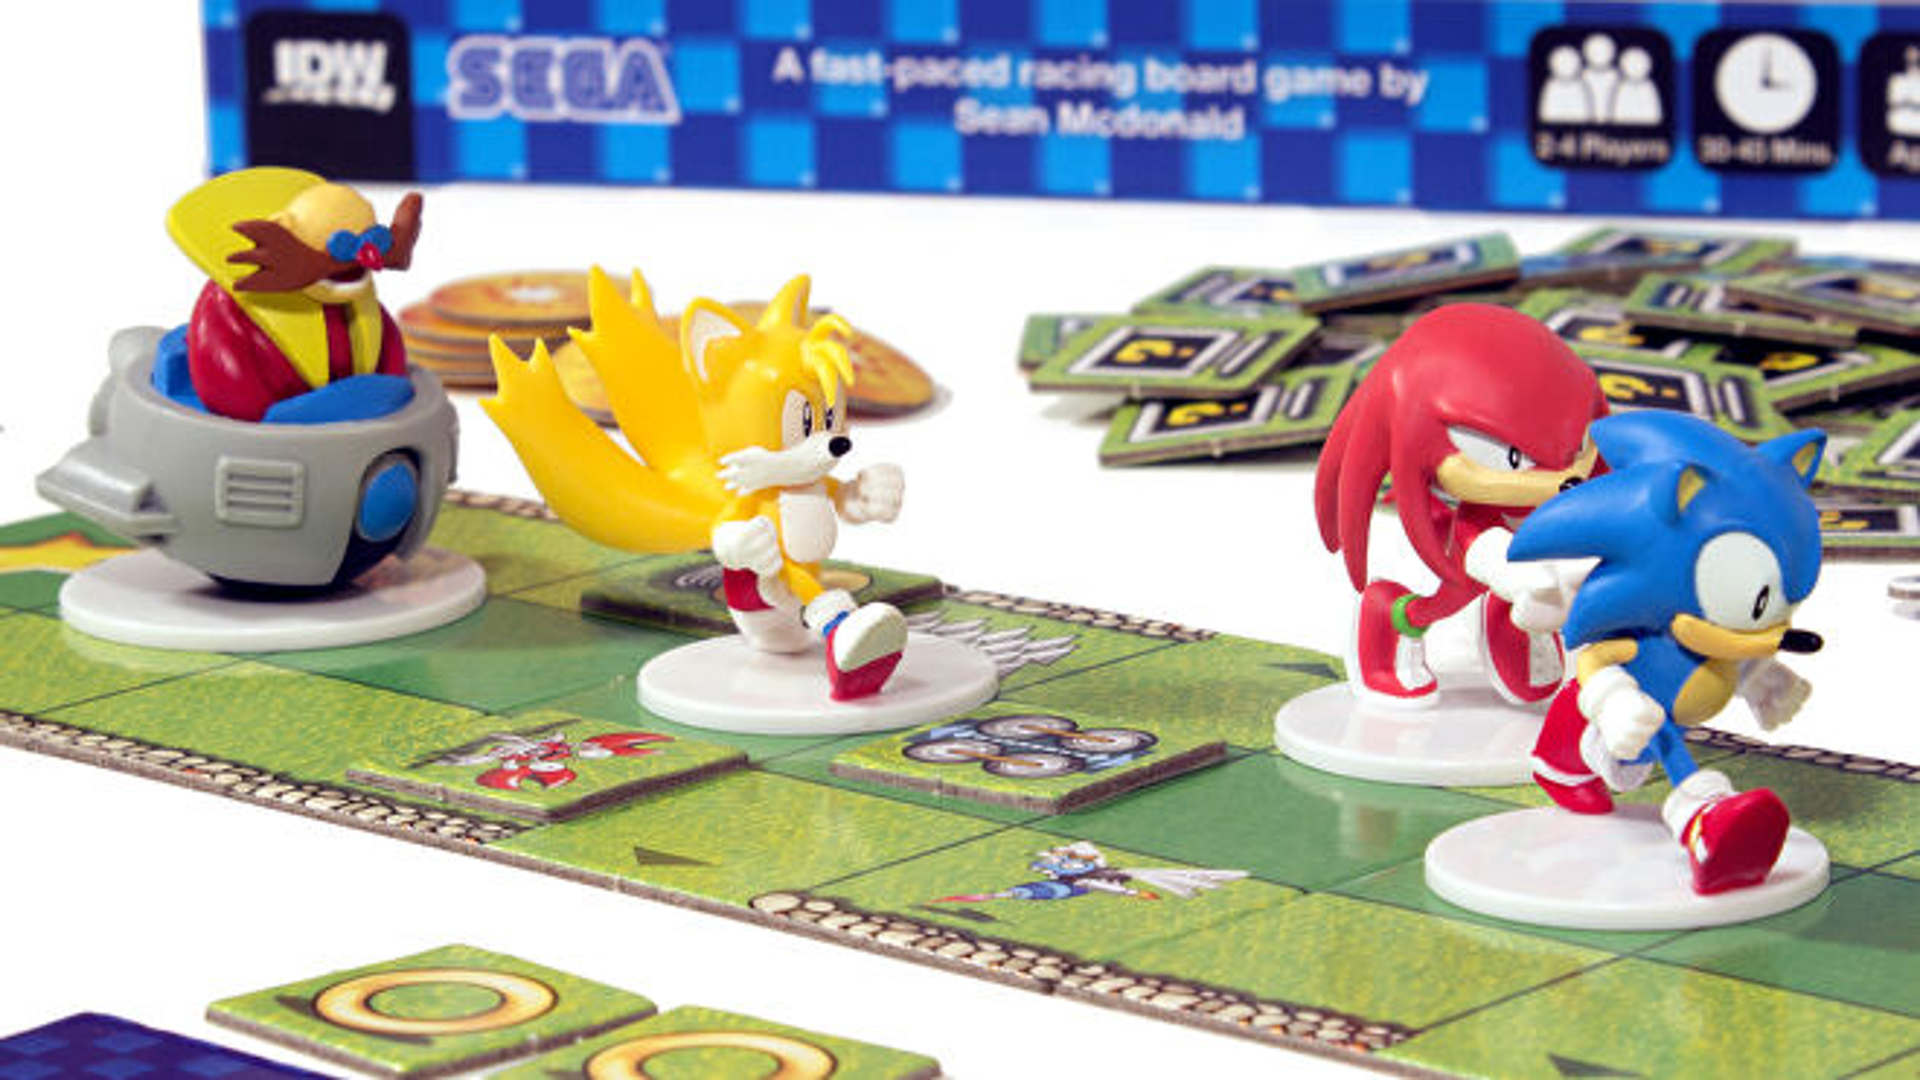 sonic-the-hedgehog-crash-course-board-game-gameplay.jpg